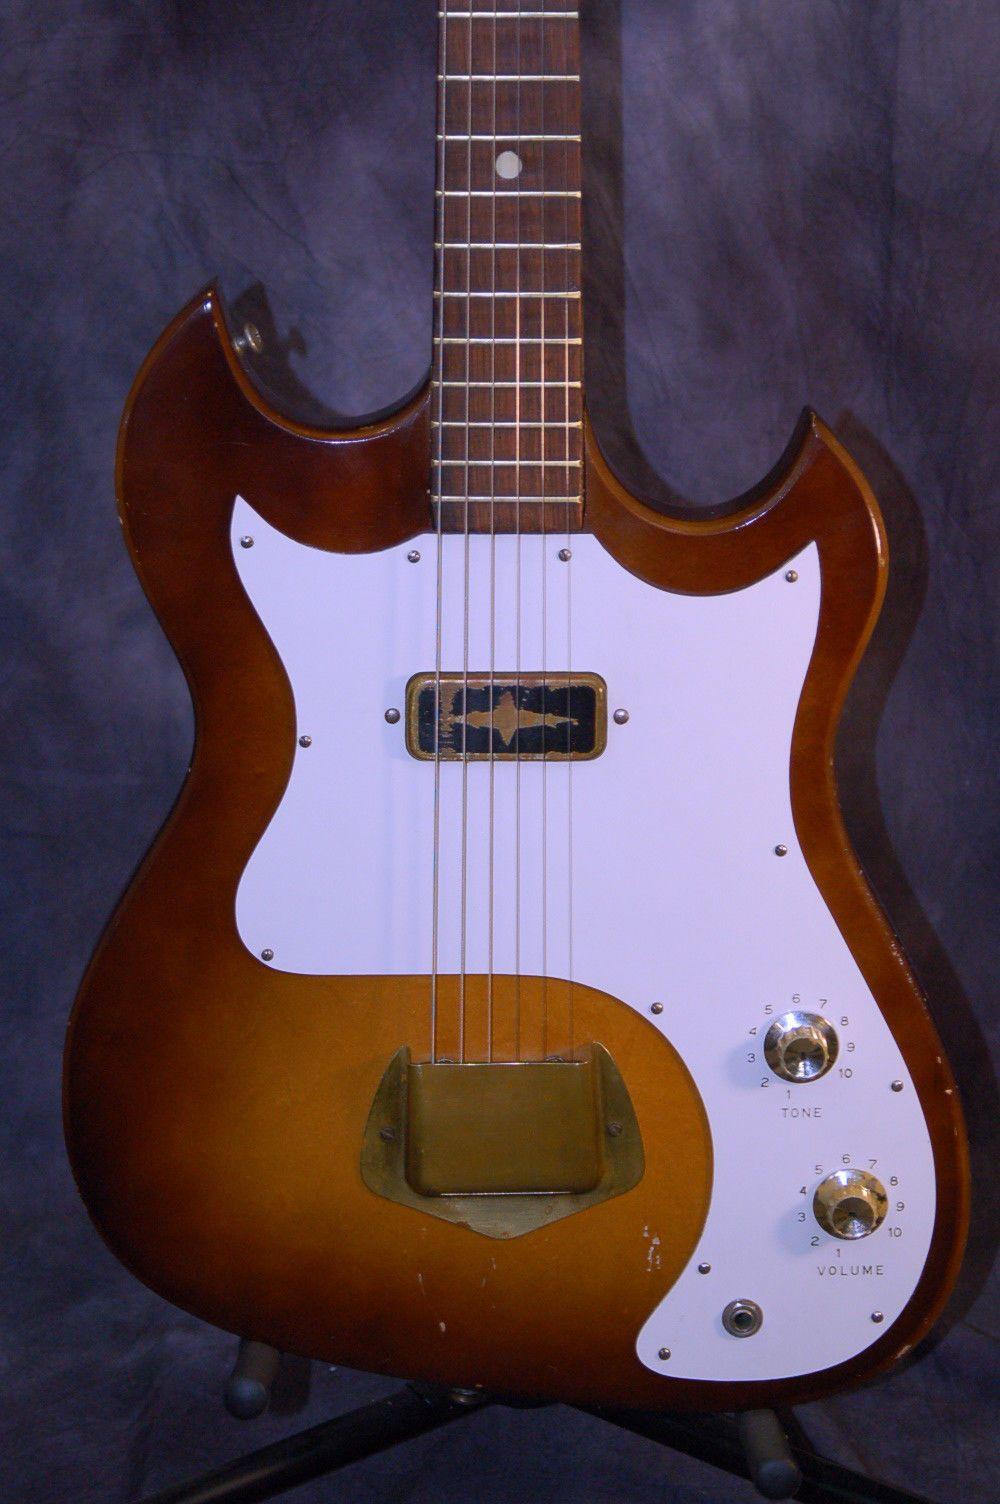 Vintage Rare 1964 Custom Kraft By Kay Vanguard Guitar Pro Setup Original Case Ebay Give Lawman Guitars A Cal Vintage Electric Guitars Guitar Electric Guitar